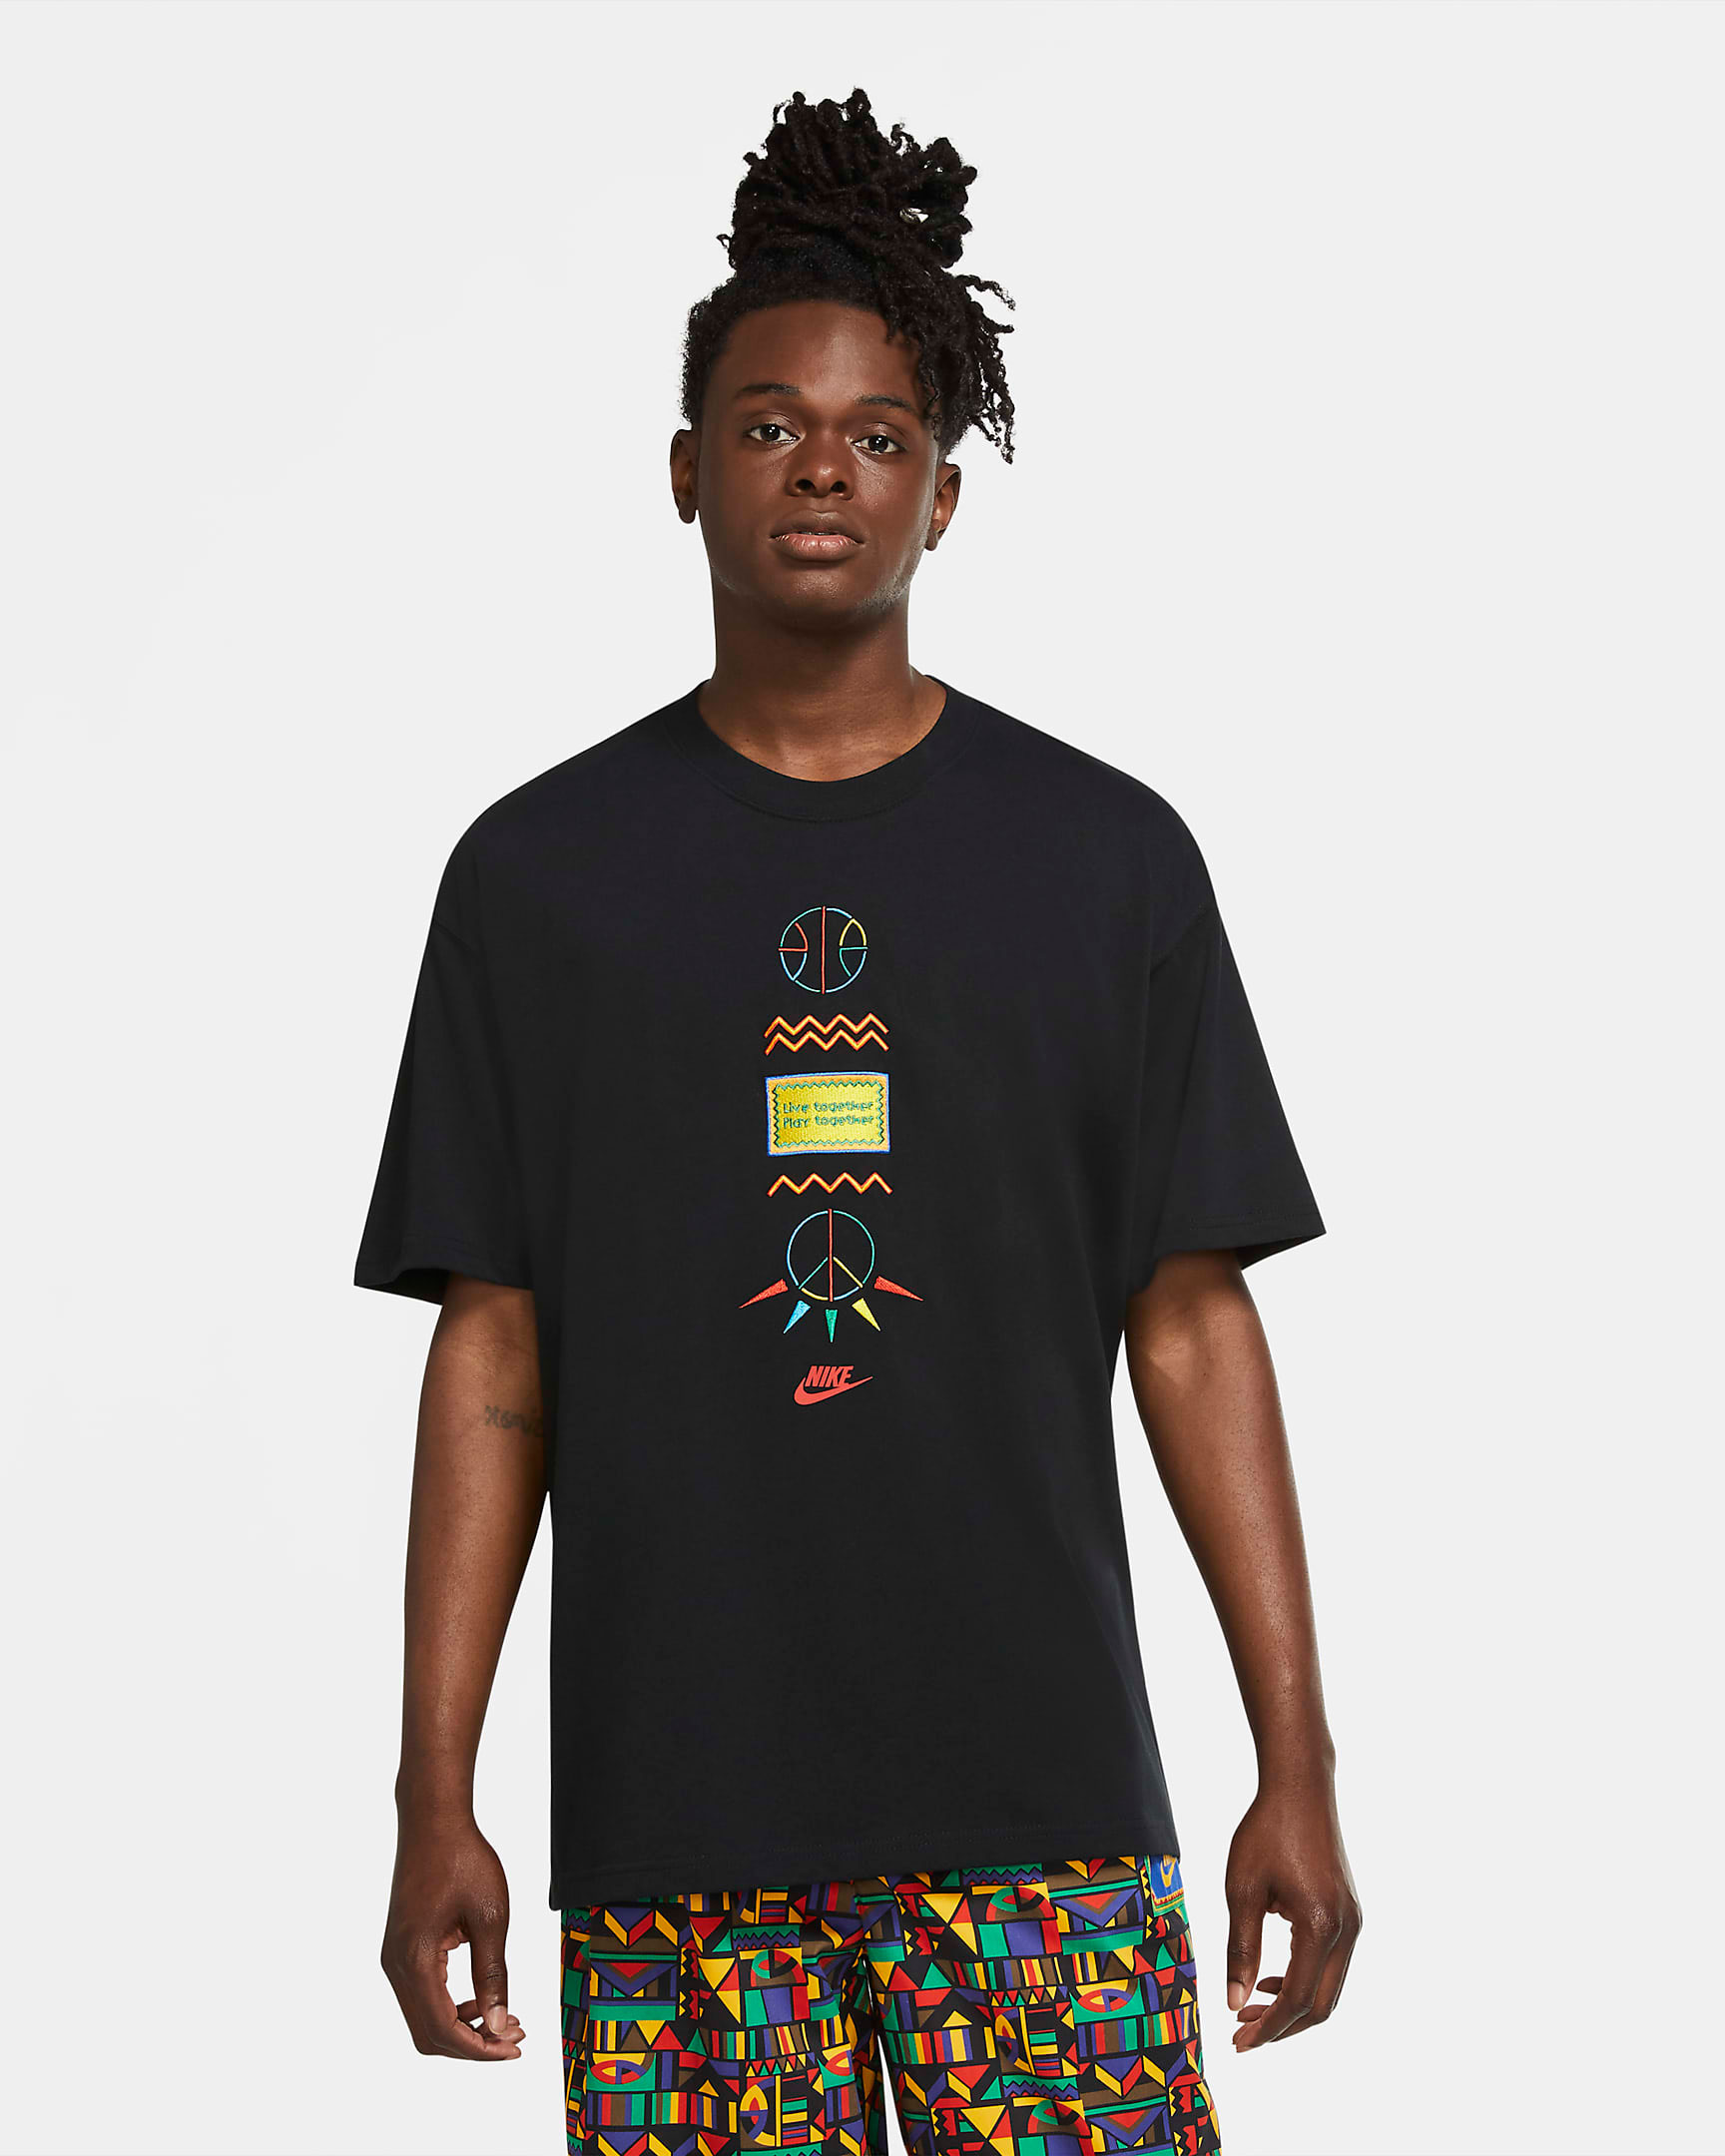 nike-urban-jungle-live-together-play-together-t-shirt-black